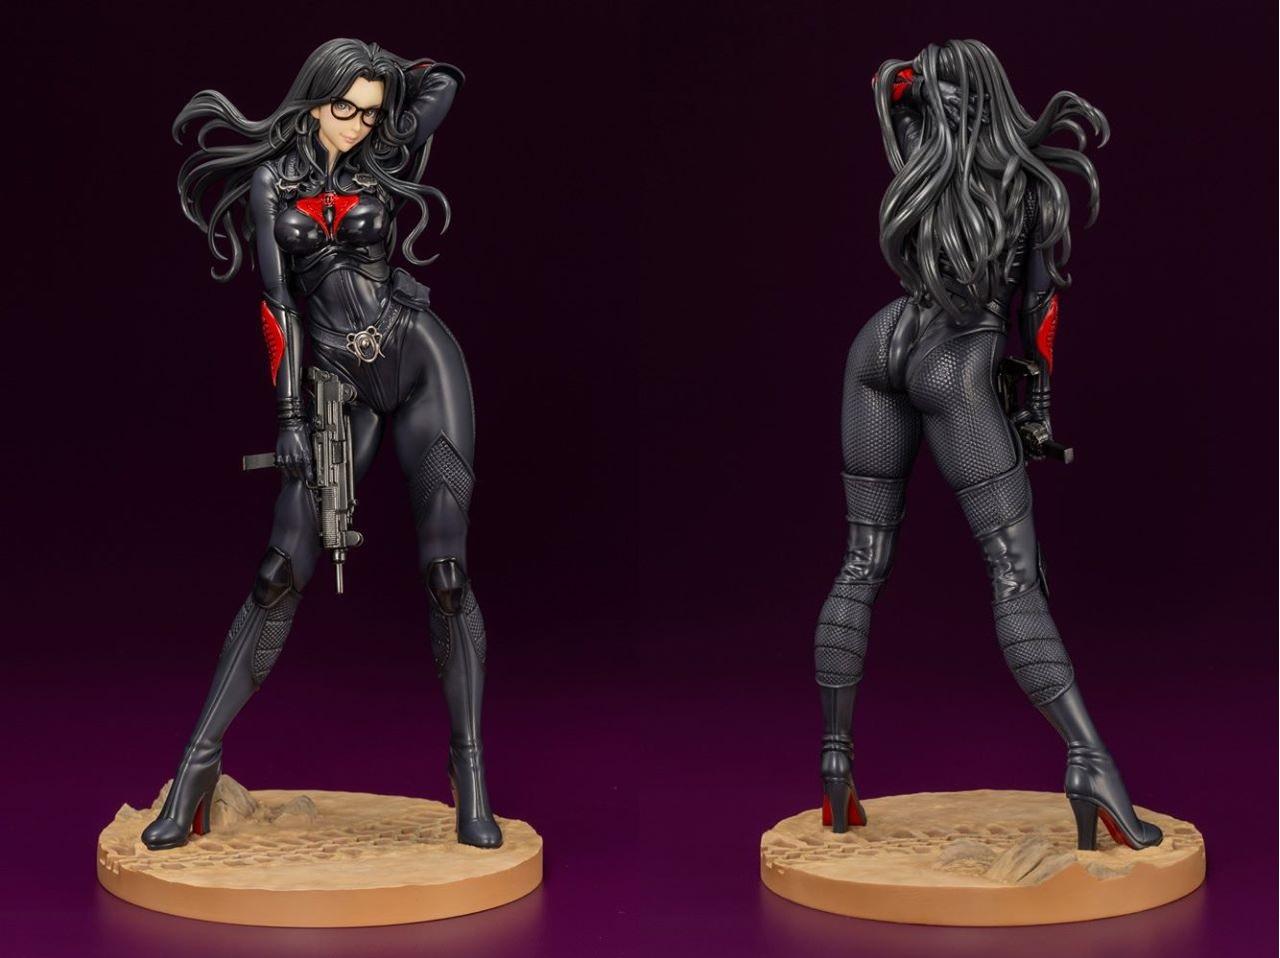 G.I Joe A Real American Hero Cobra Enemy Baroness Bishoujo Statue by Kotobukiya